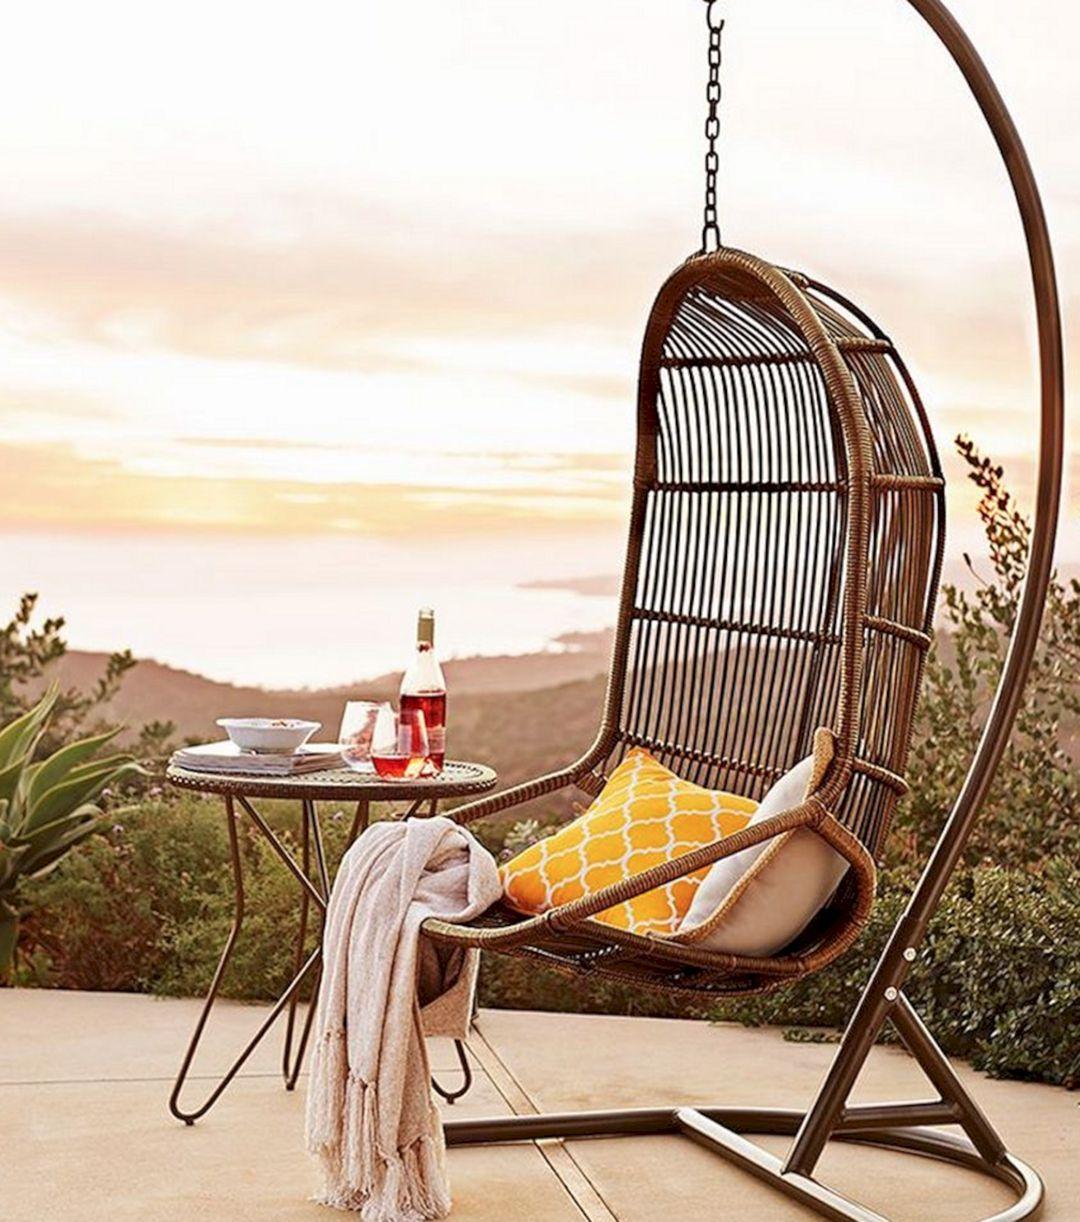 DIY Hammock Furniture Ideas